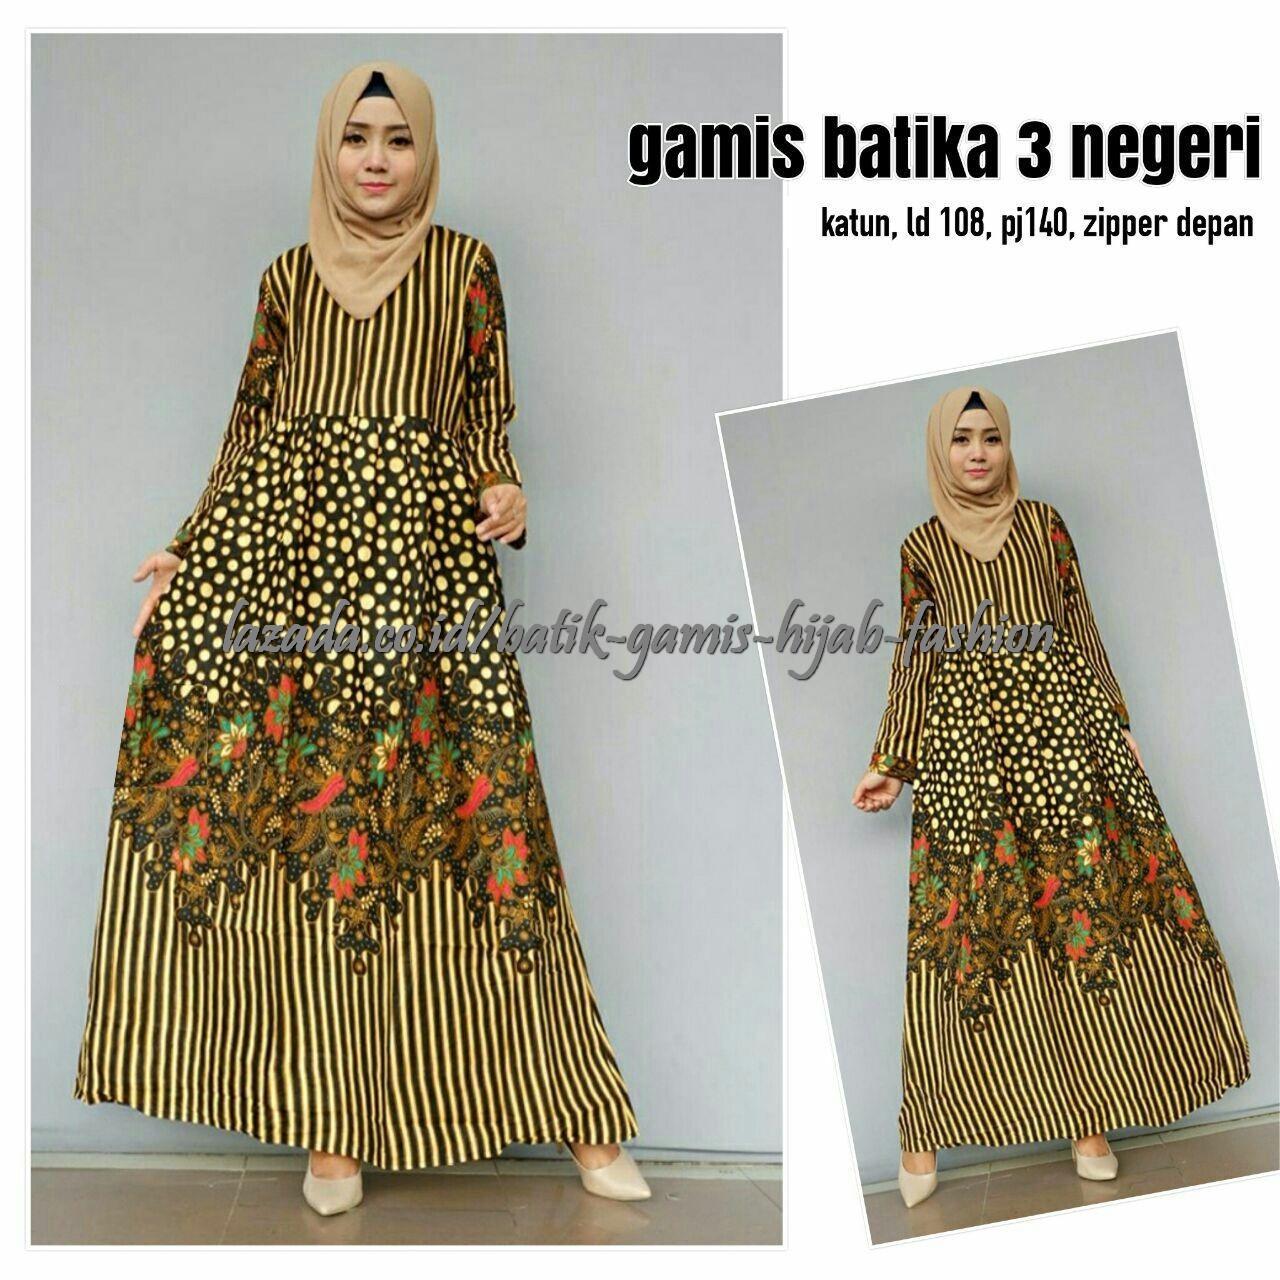 Terbaru Baju Muslim Gamis Batik Atasan Wanita Batika 3 Negeri - A